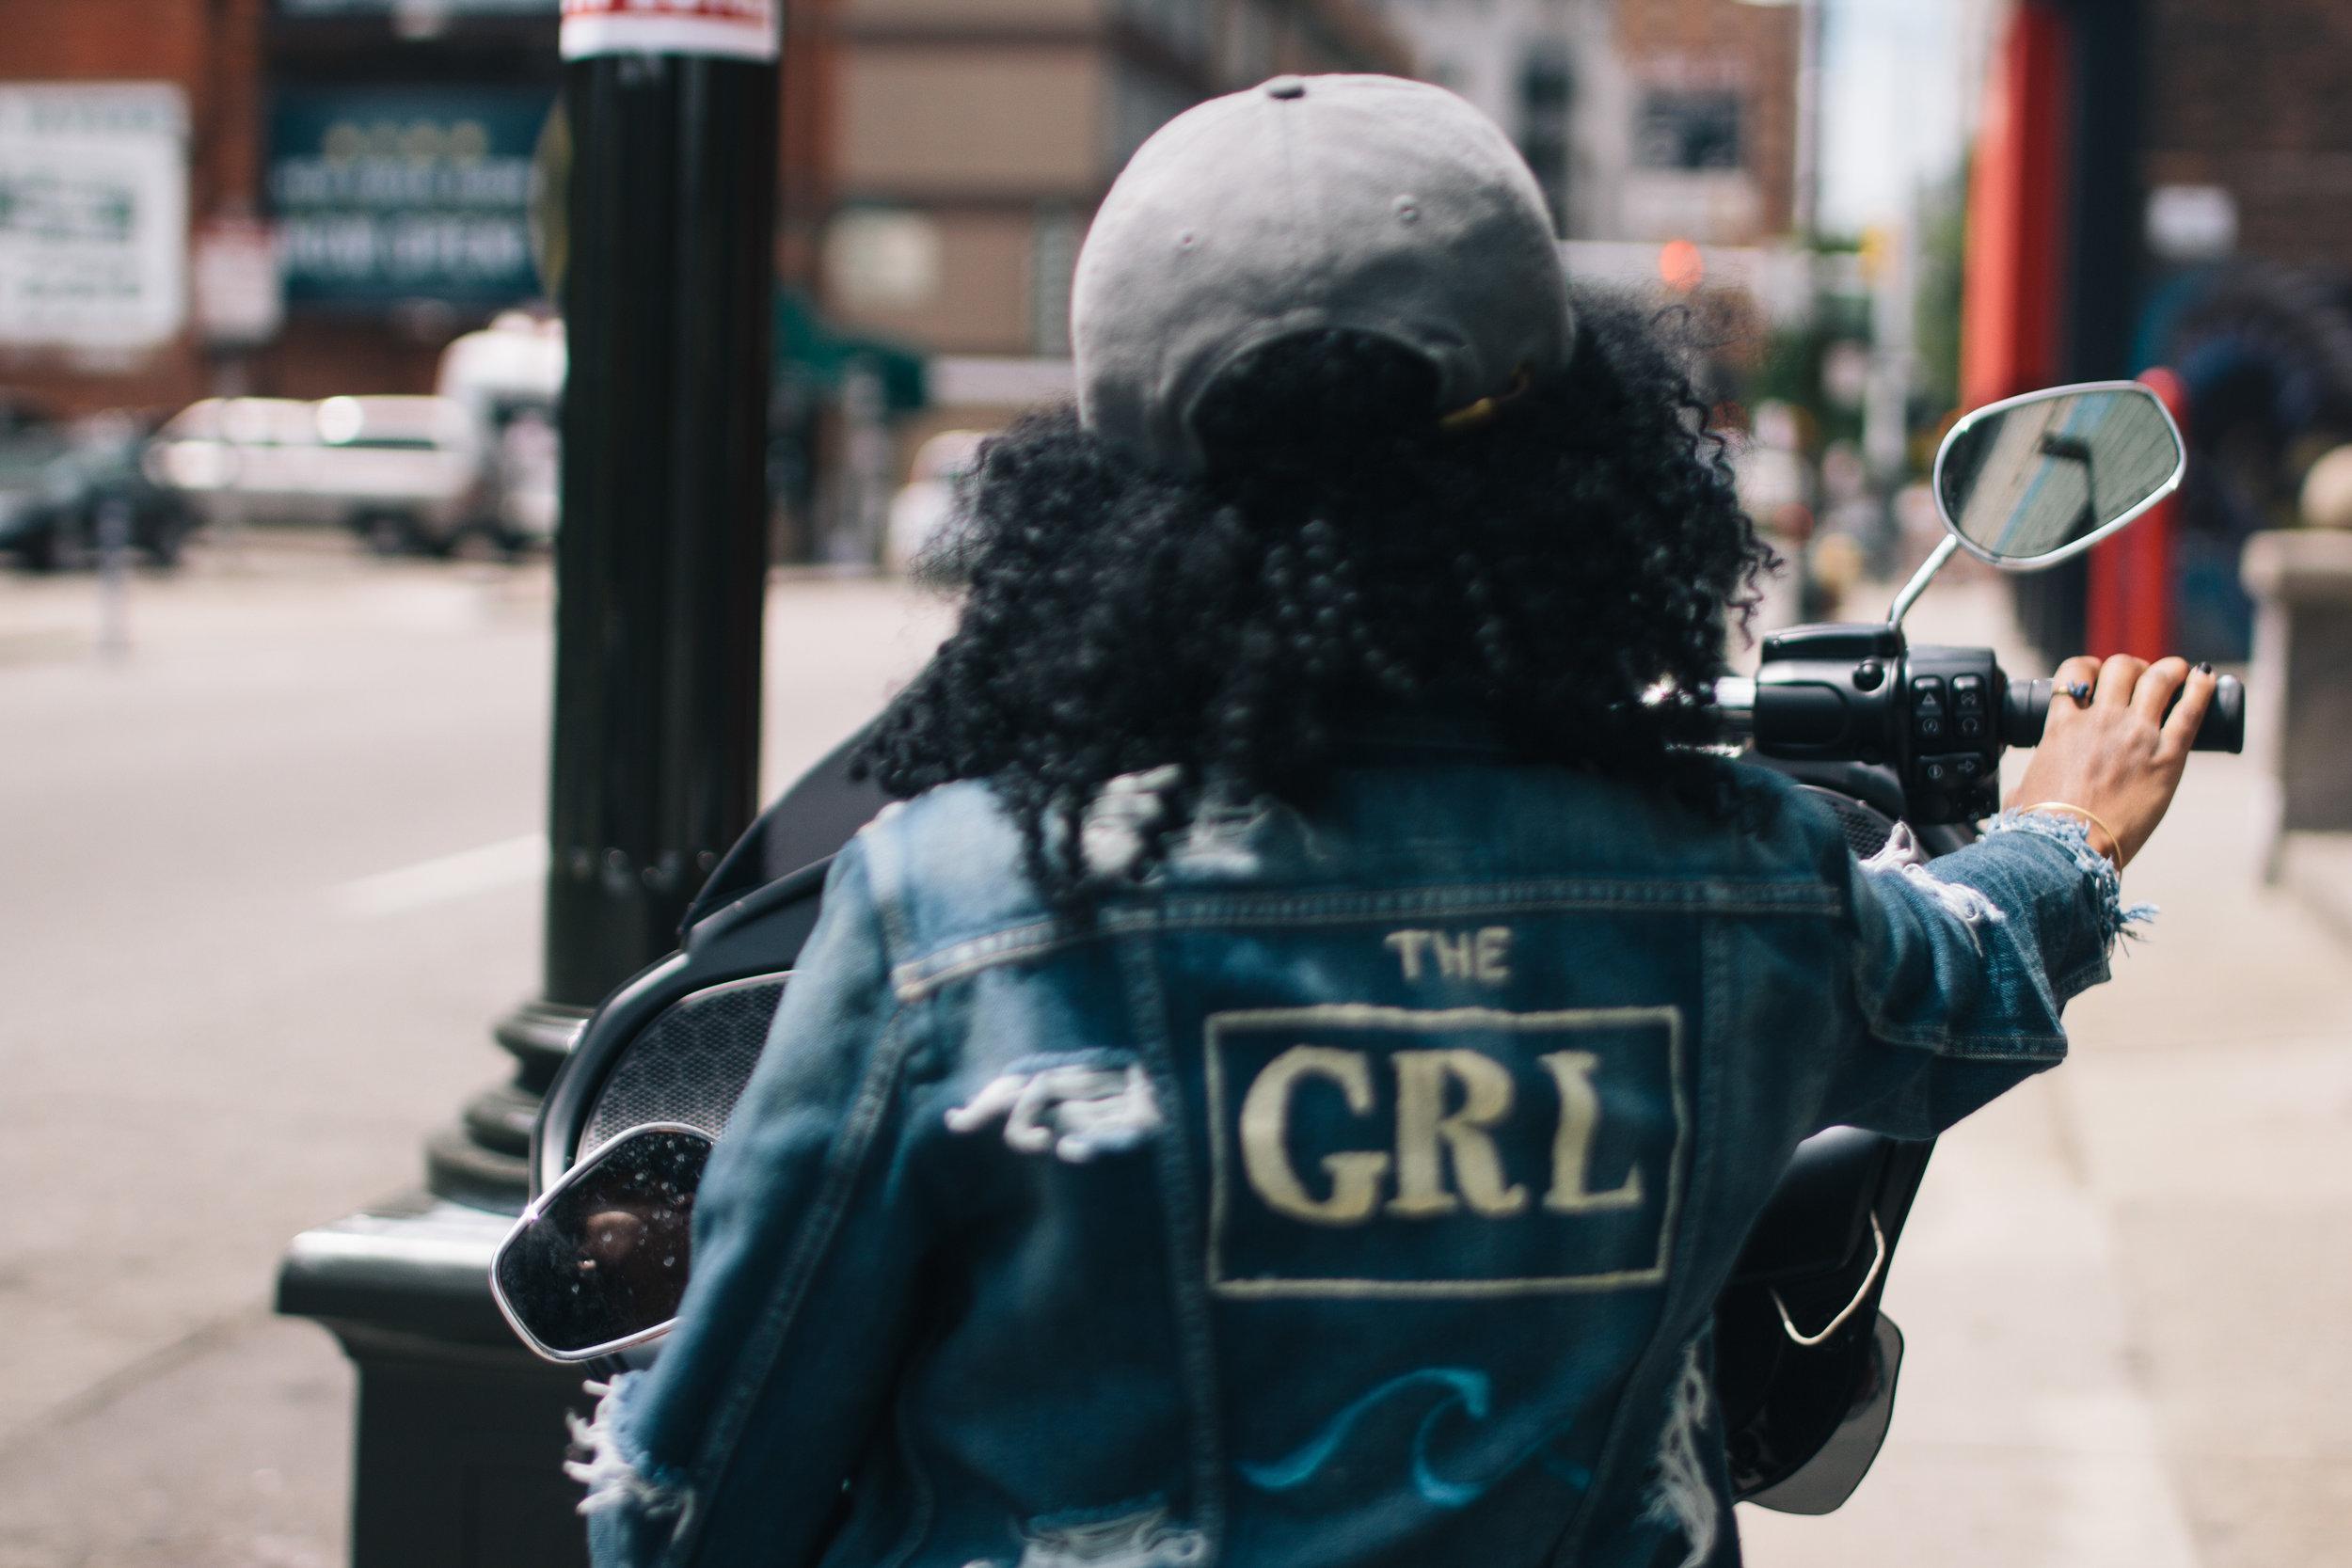 THE-GRL